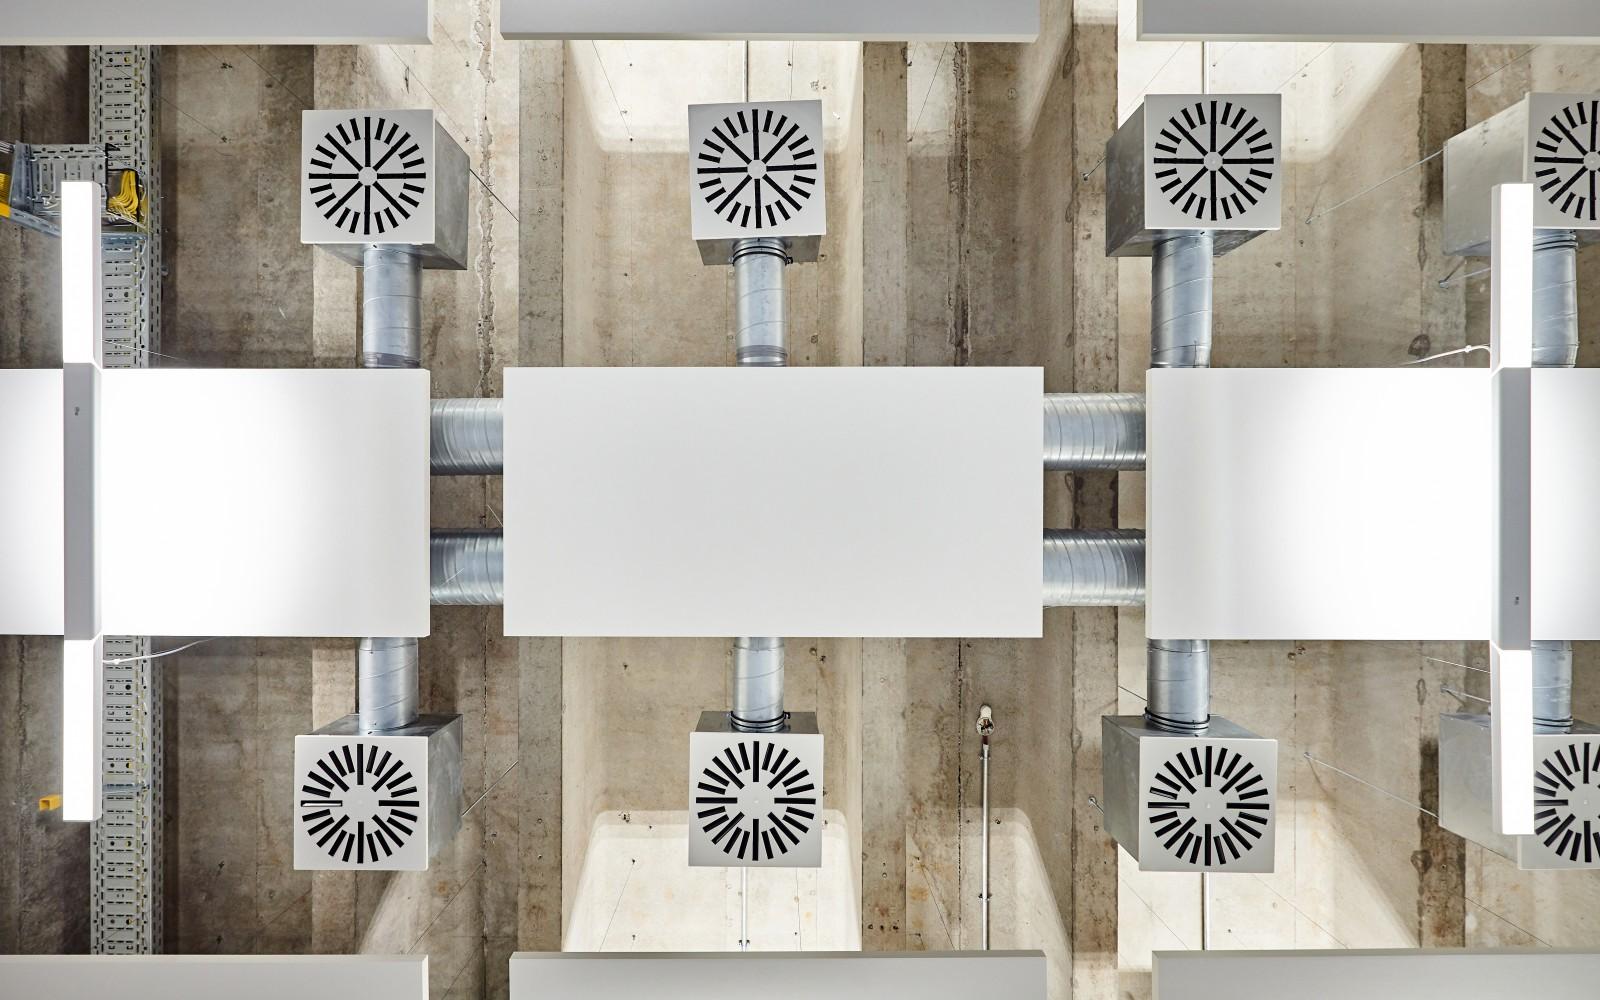 umbau-fb elektrotechnik-haw-hh-wohn-buerobauten-01-deckensegel